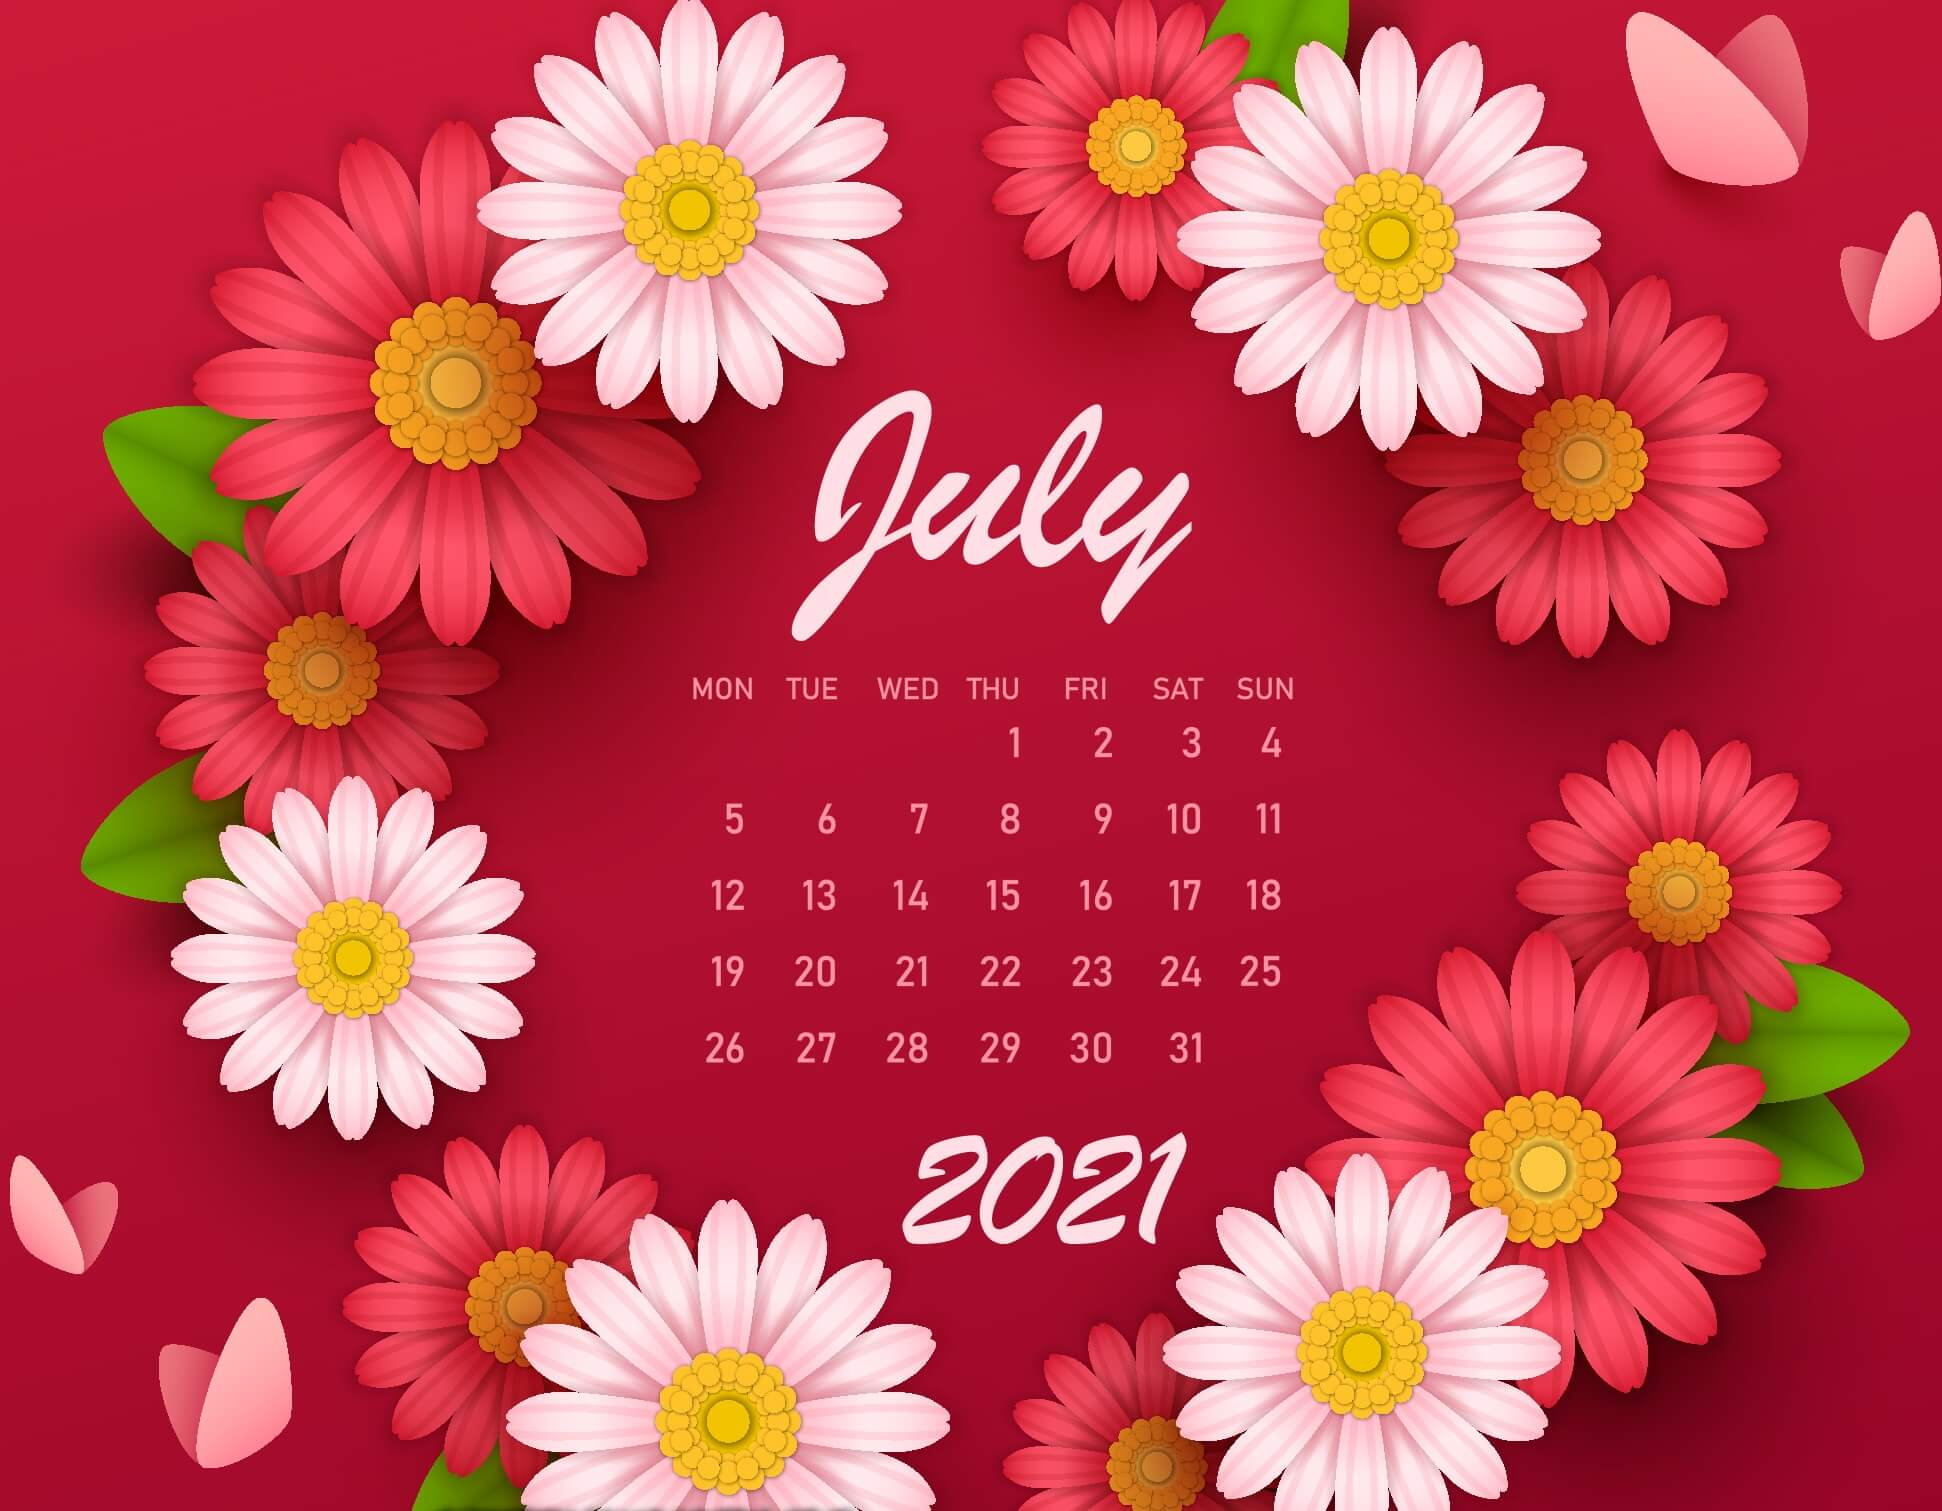 Cute July 2021 Calendar Floral